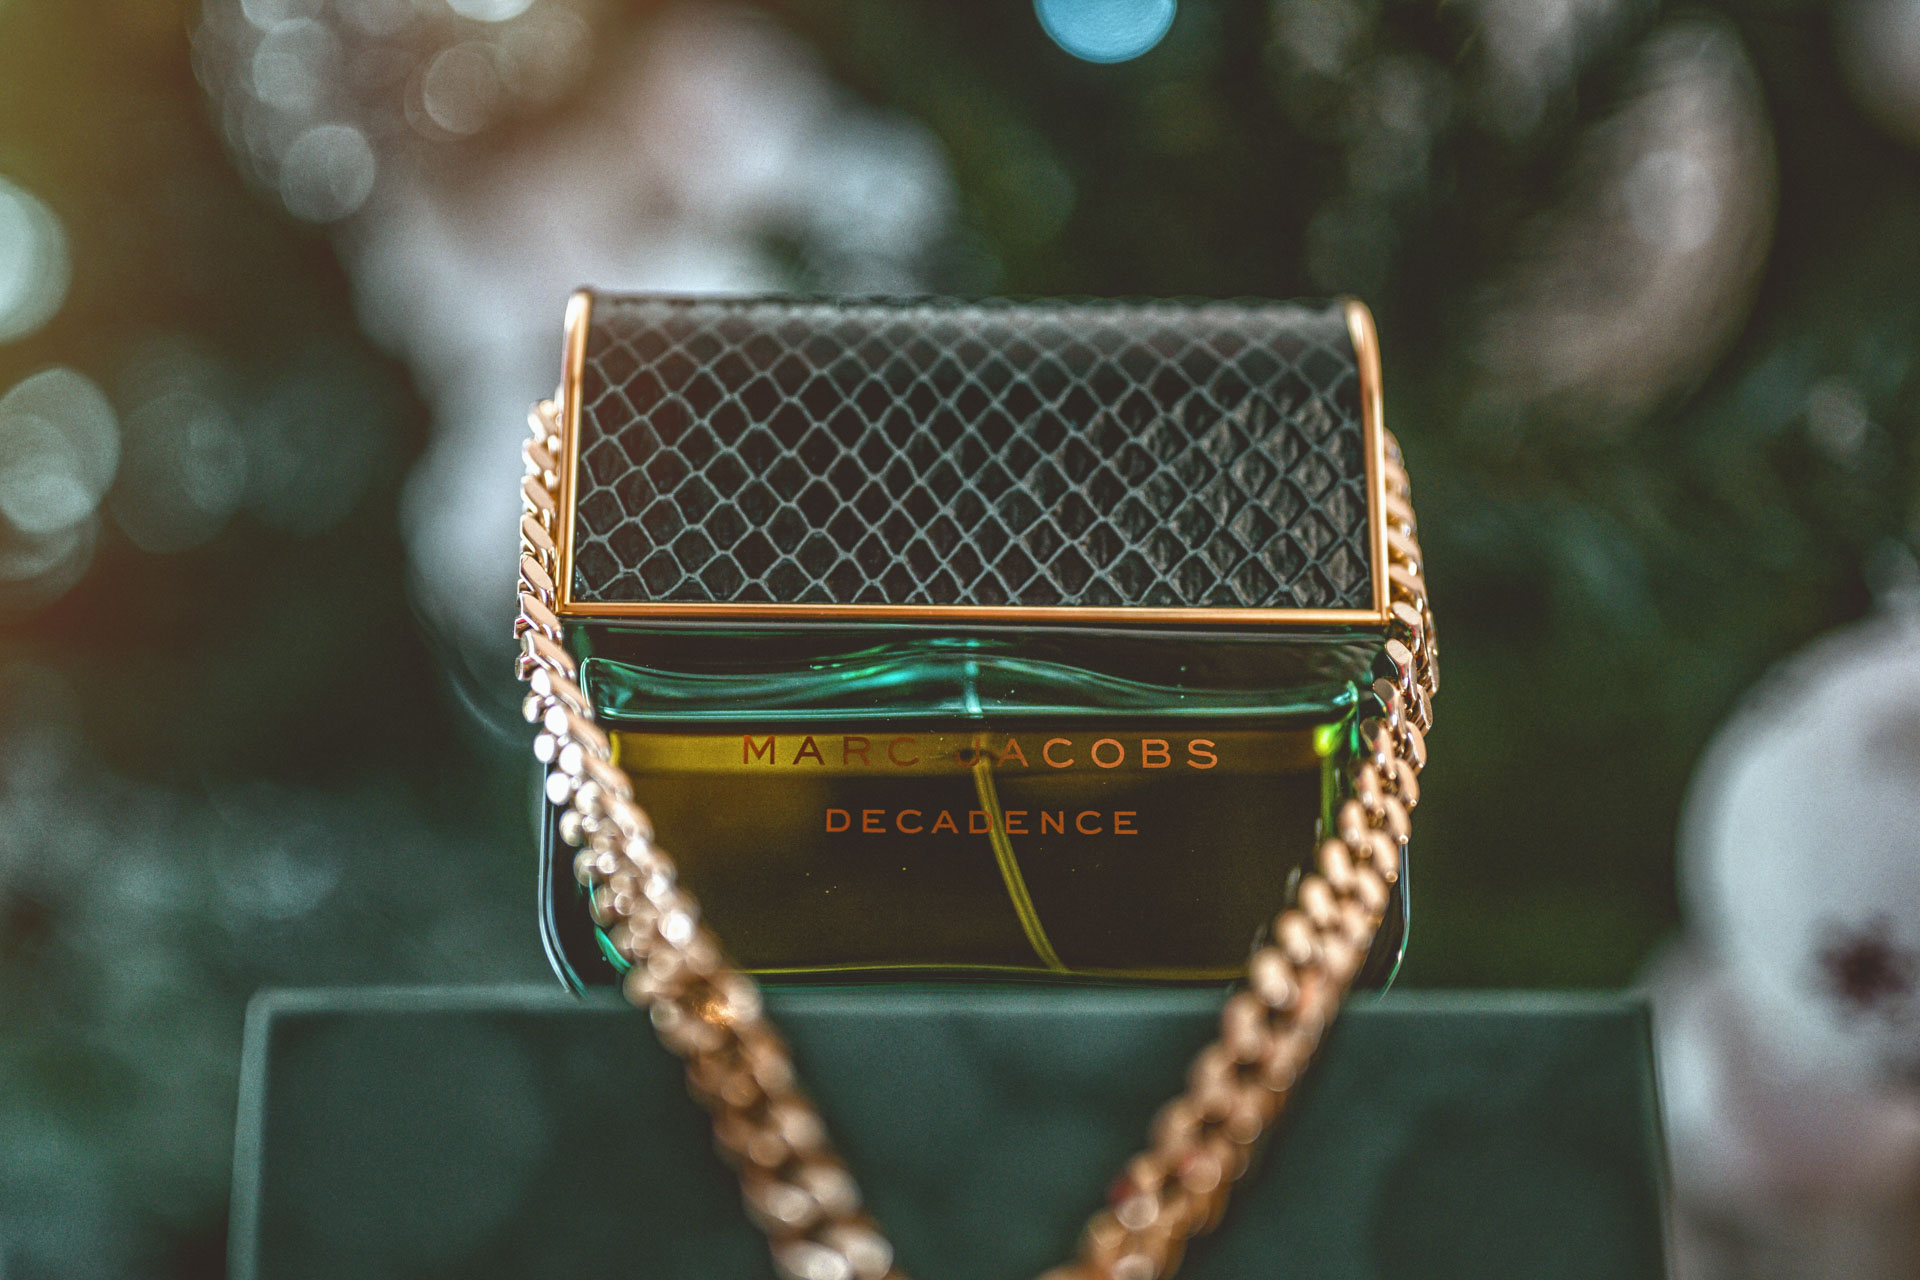 Parfum Marc Jacobs Decadence - Cadou perfect de Craciun